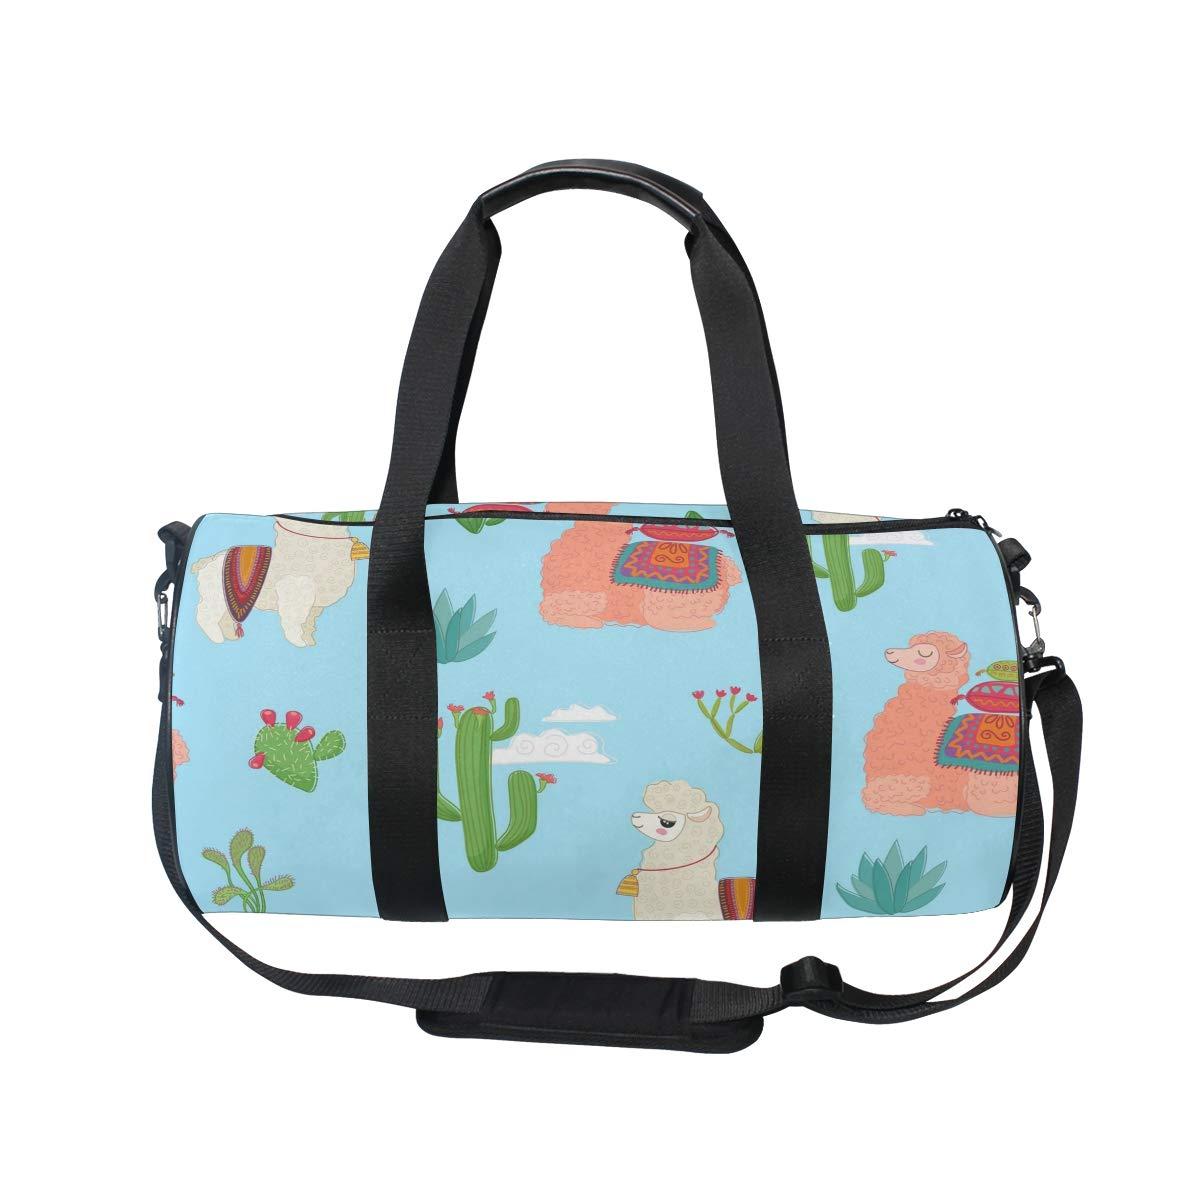 Llama Unisex's Duffel Bag Travel Tote Luggage Bag Gym Sports Luggage Bag by EVERUI (Image #2)